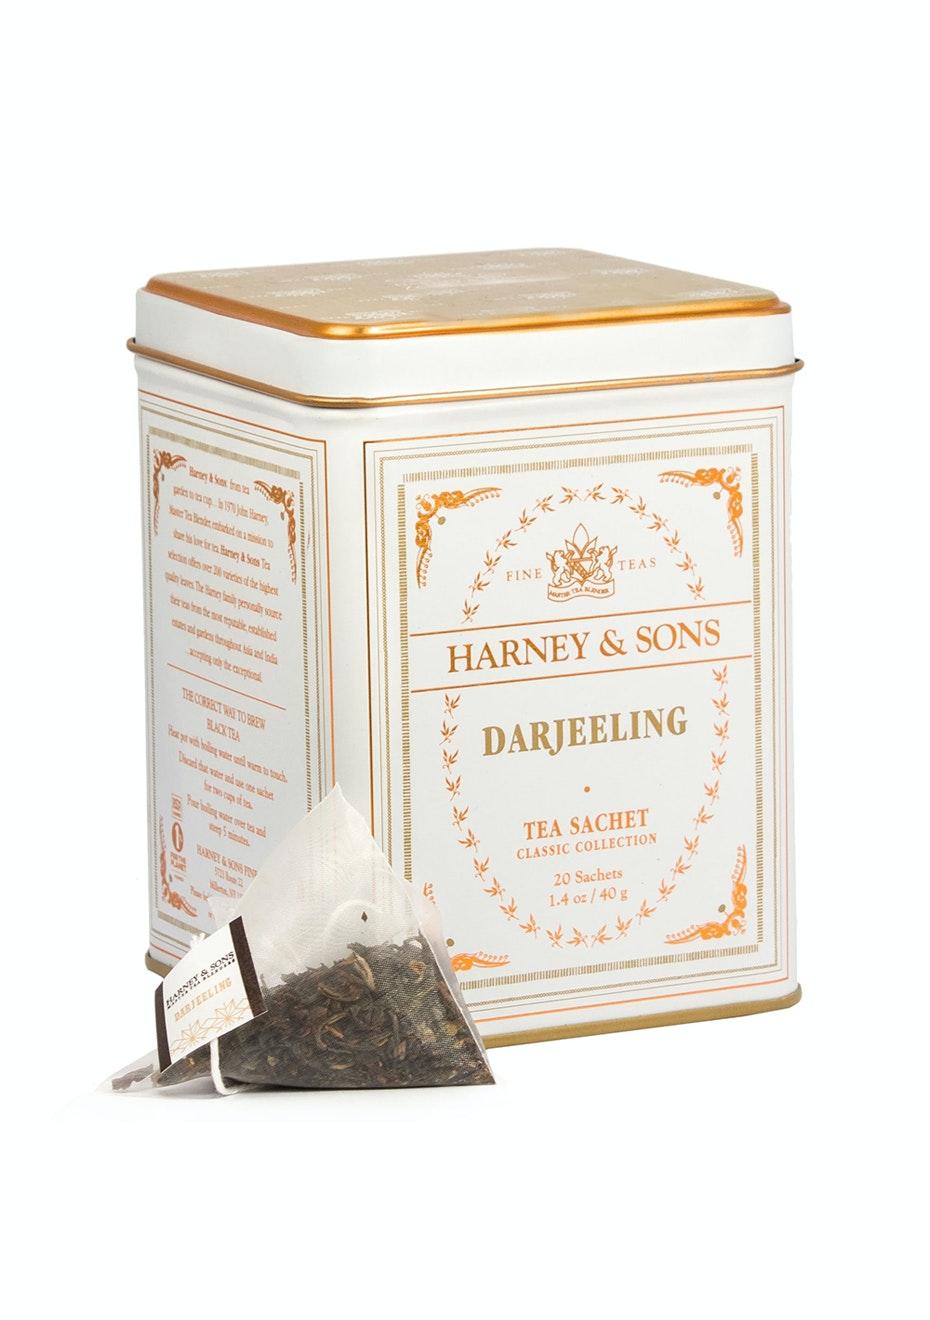 Harney & Sons - Darjeeling - 20 Sachet Tin